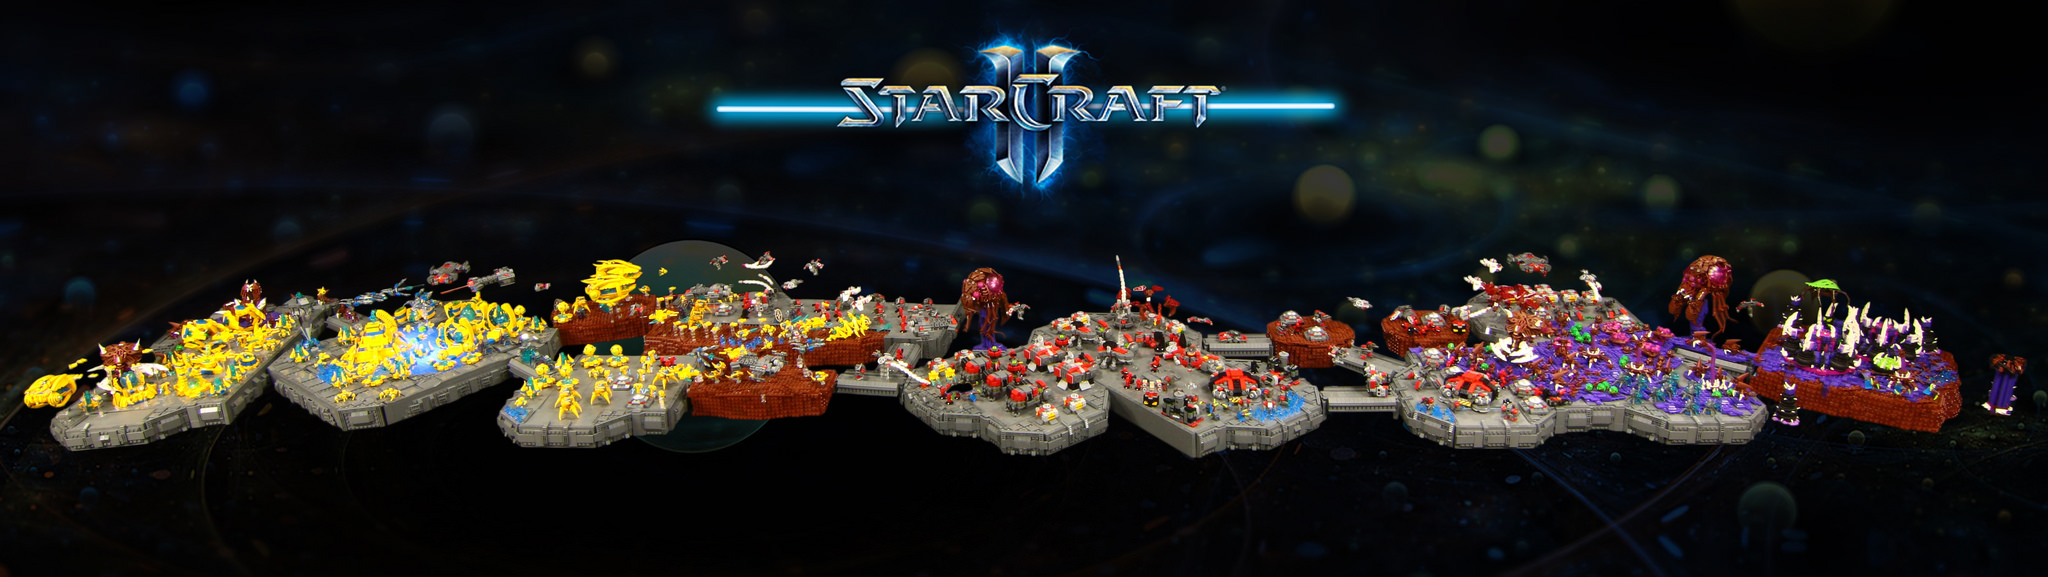 Lego StarCraft 2 (12)